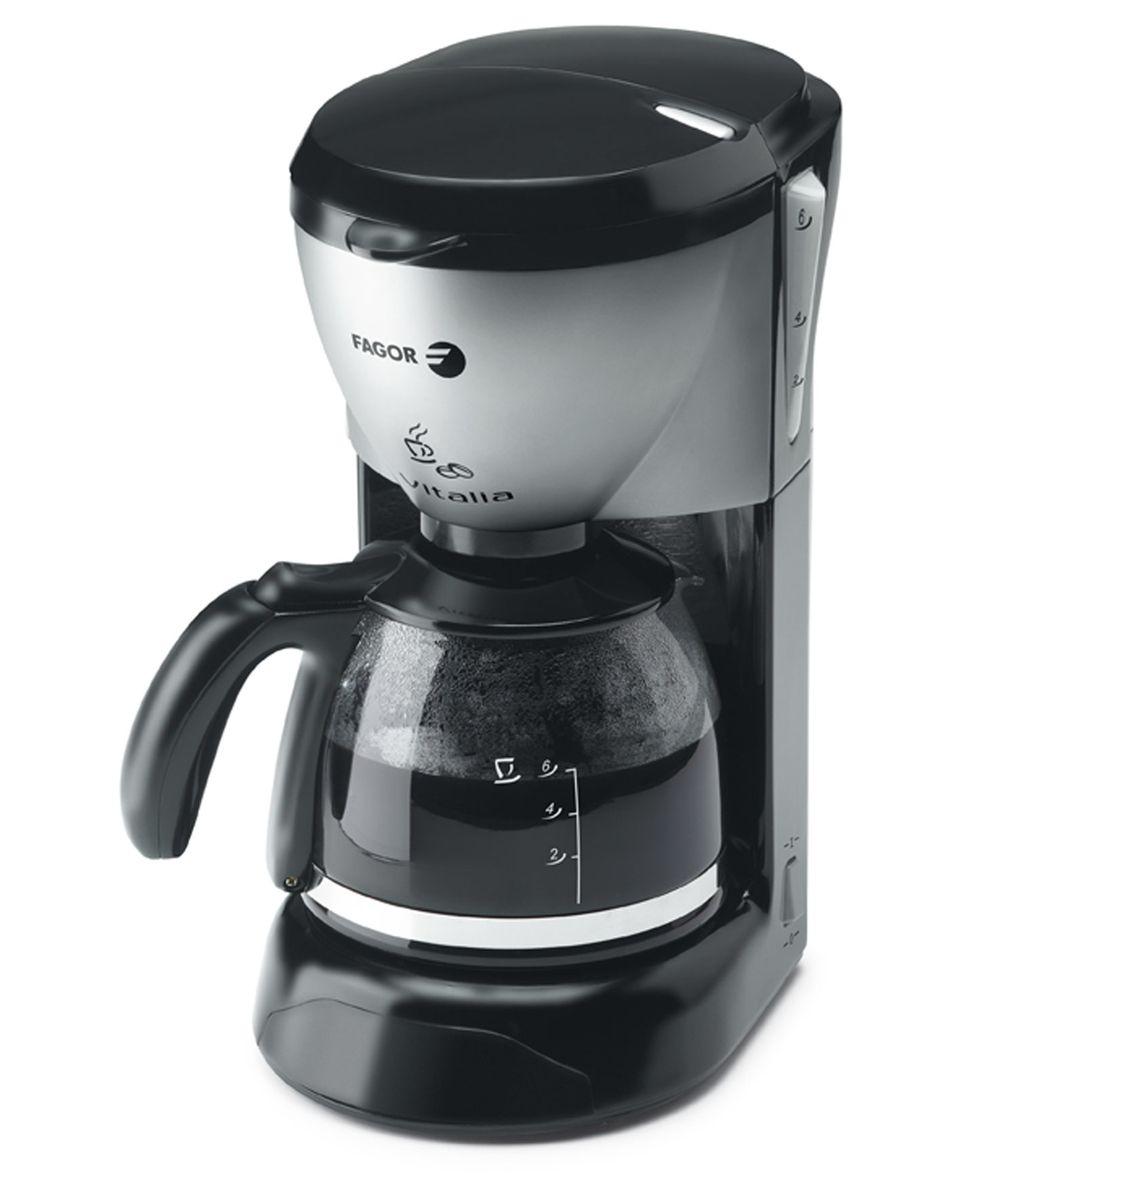 Coffee Maker เคร องชงกาแฟ เคร องชงกาแฟ